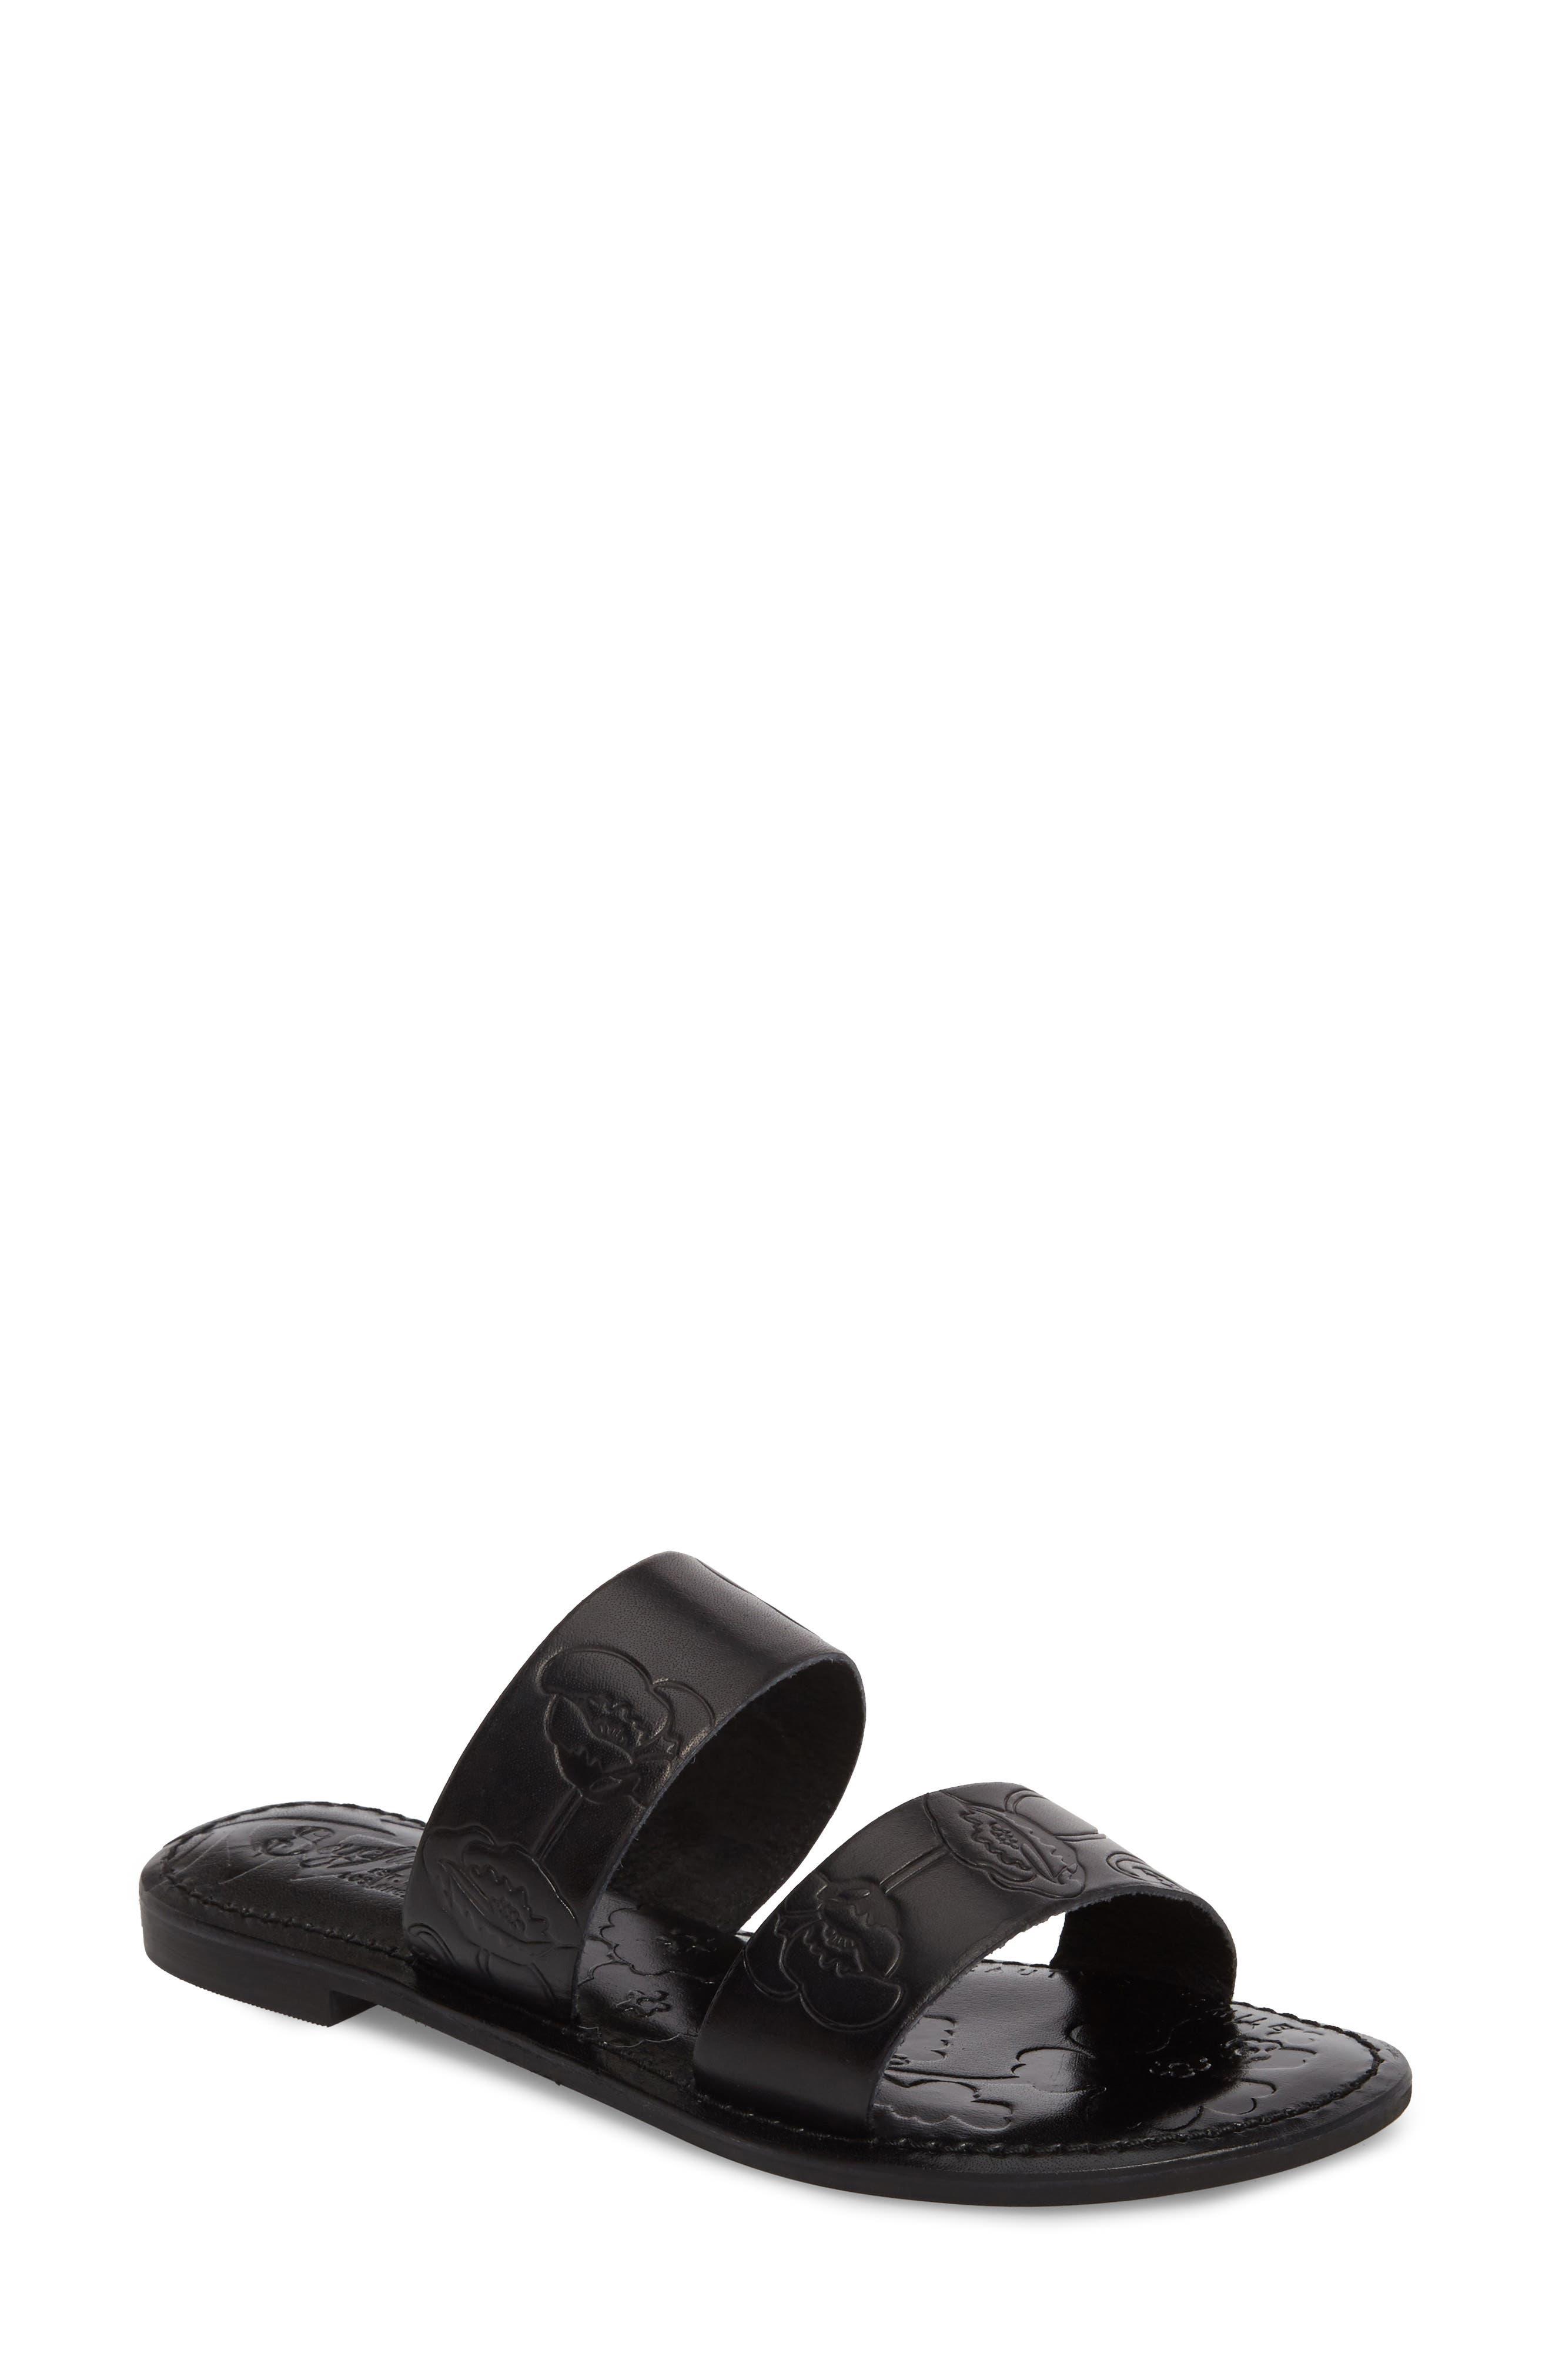 Sheroes Slide Sandal,                             Main thumbnail 1, color,                             BLACK LEATHER